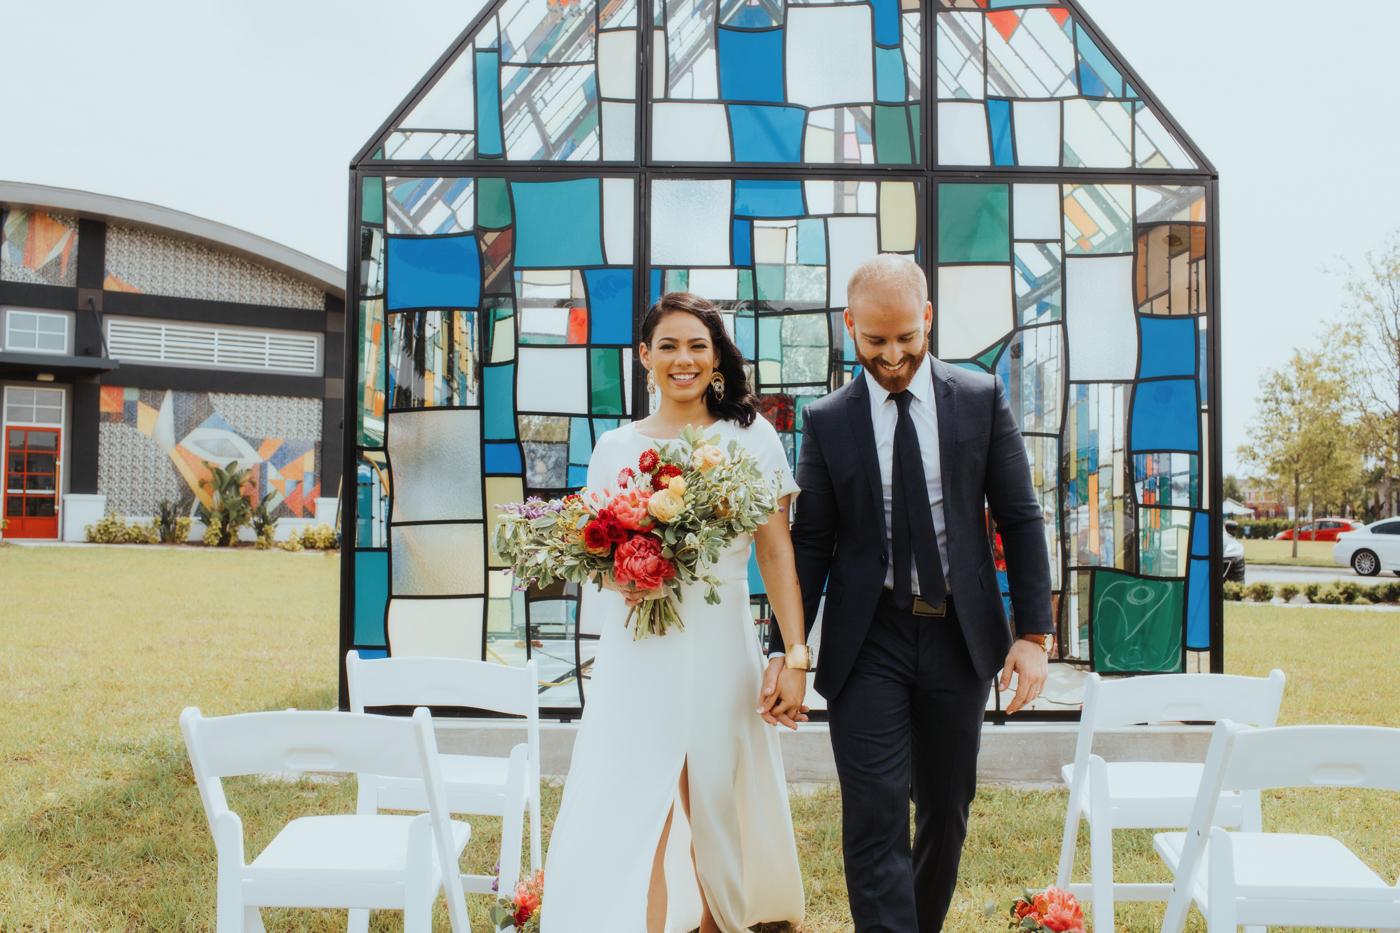 Wedding | Canvas Market | Lake Nona-Orlando, FL  | Vanessa Boy Photography | vanessaboy.com-288.com |Green Wedding Shoes.jpg